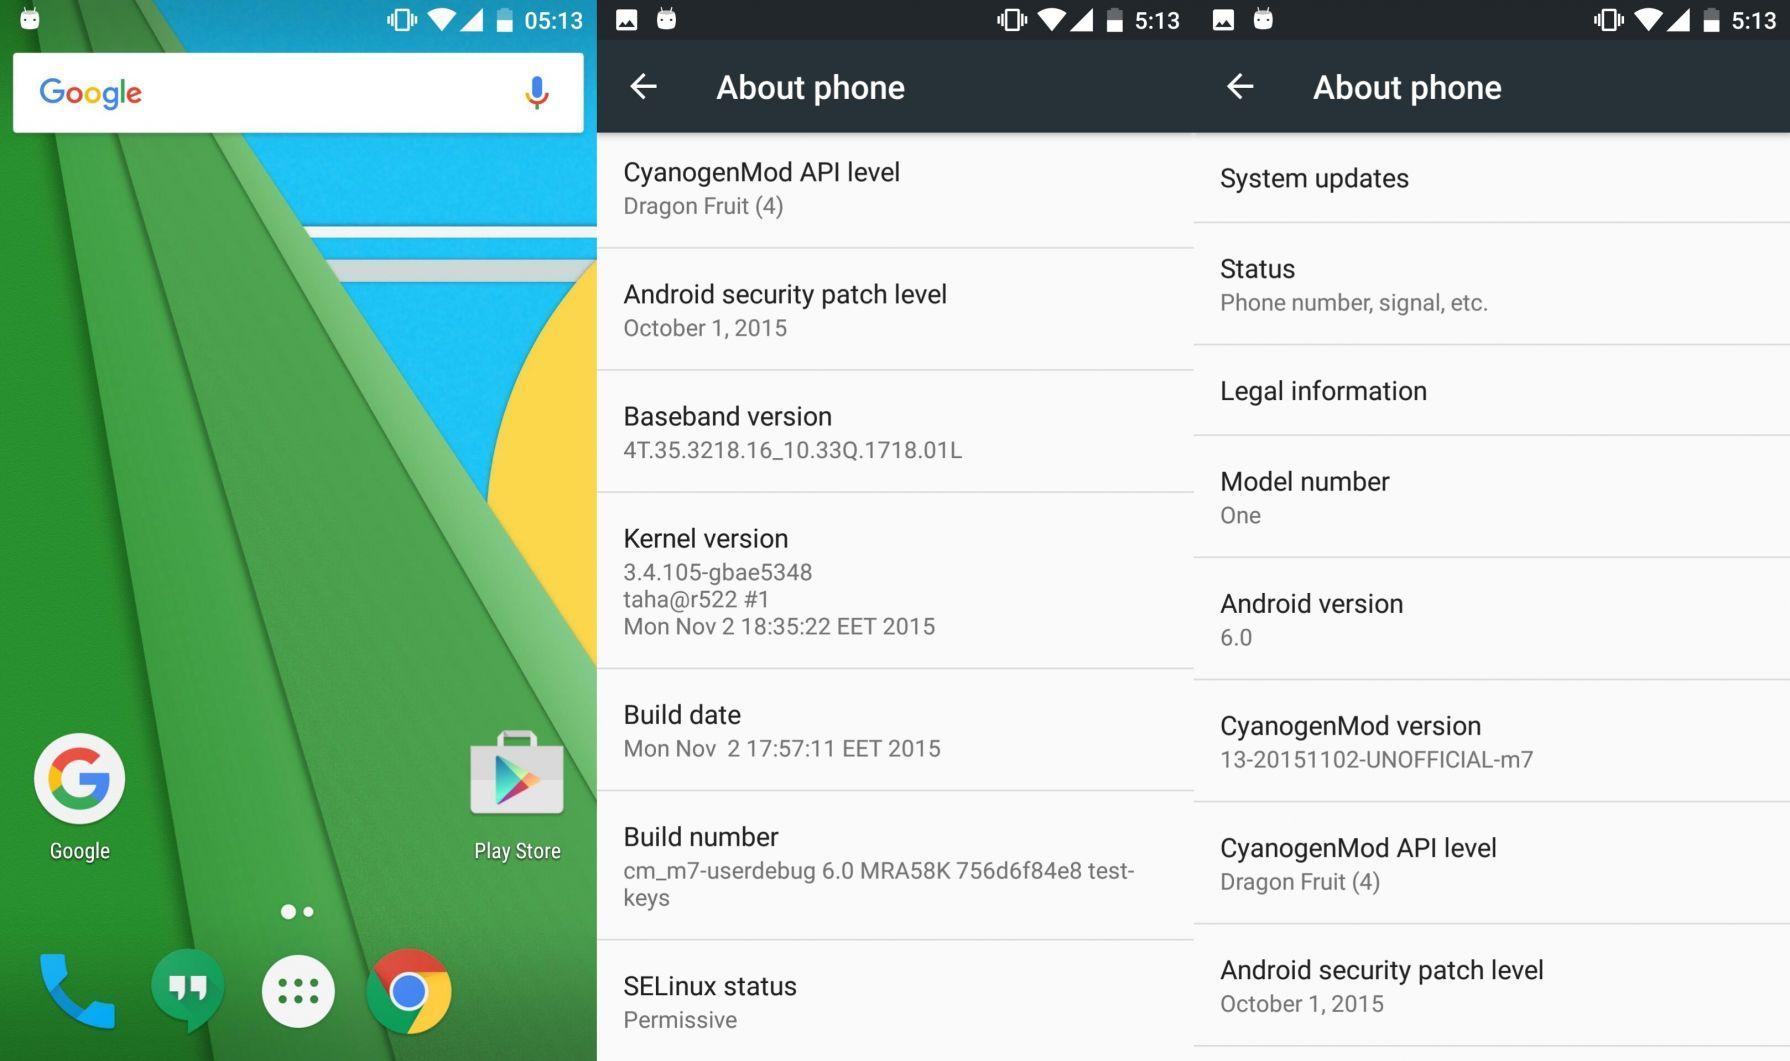 CyanogenMod 13 unofficial HTC One M7